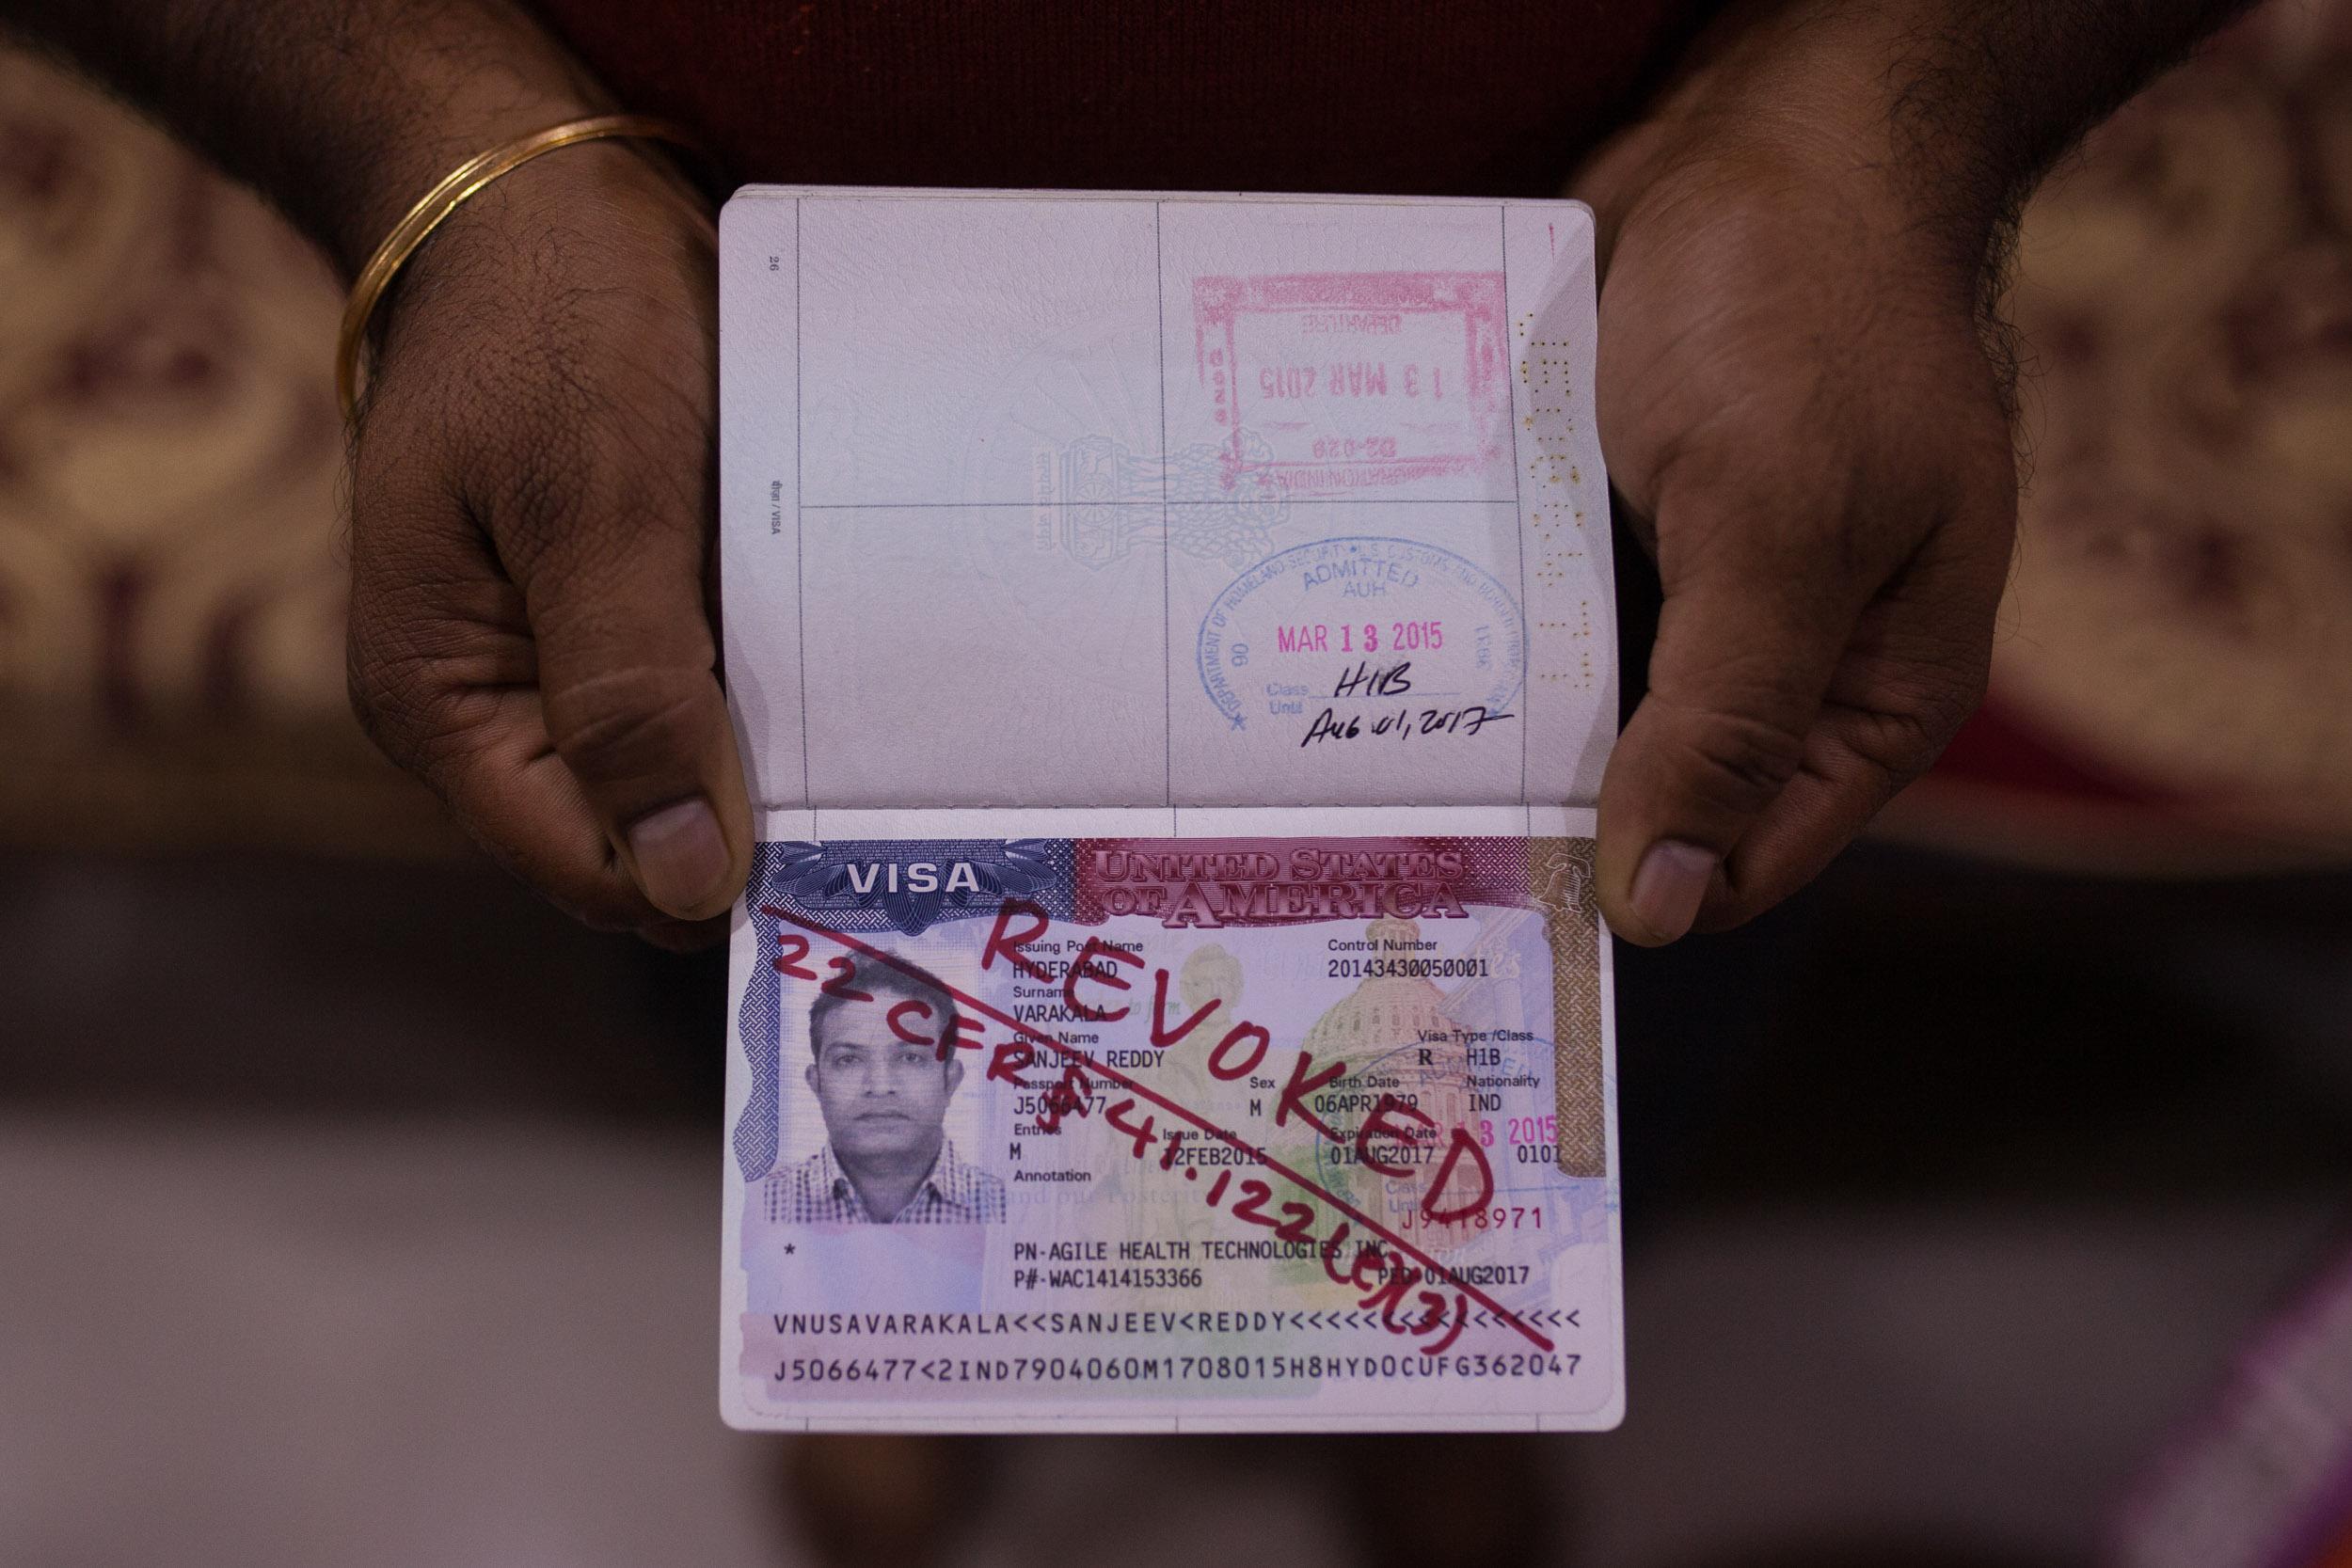 Sanjeev's Indian passport, with the revoked U.S. visa.